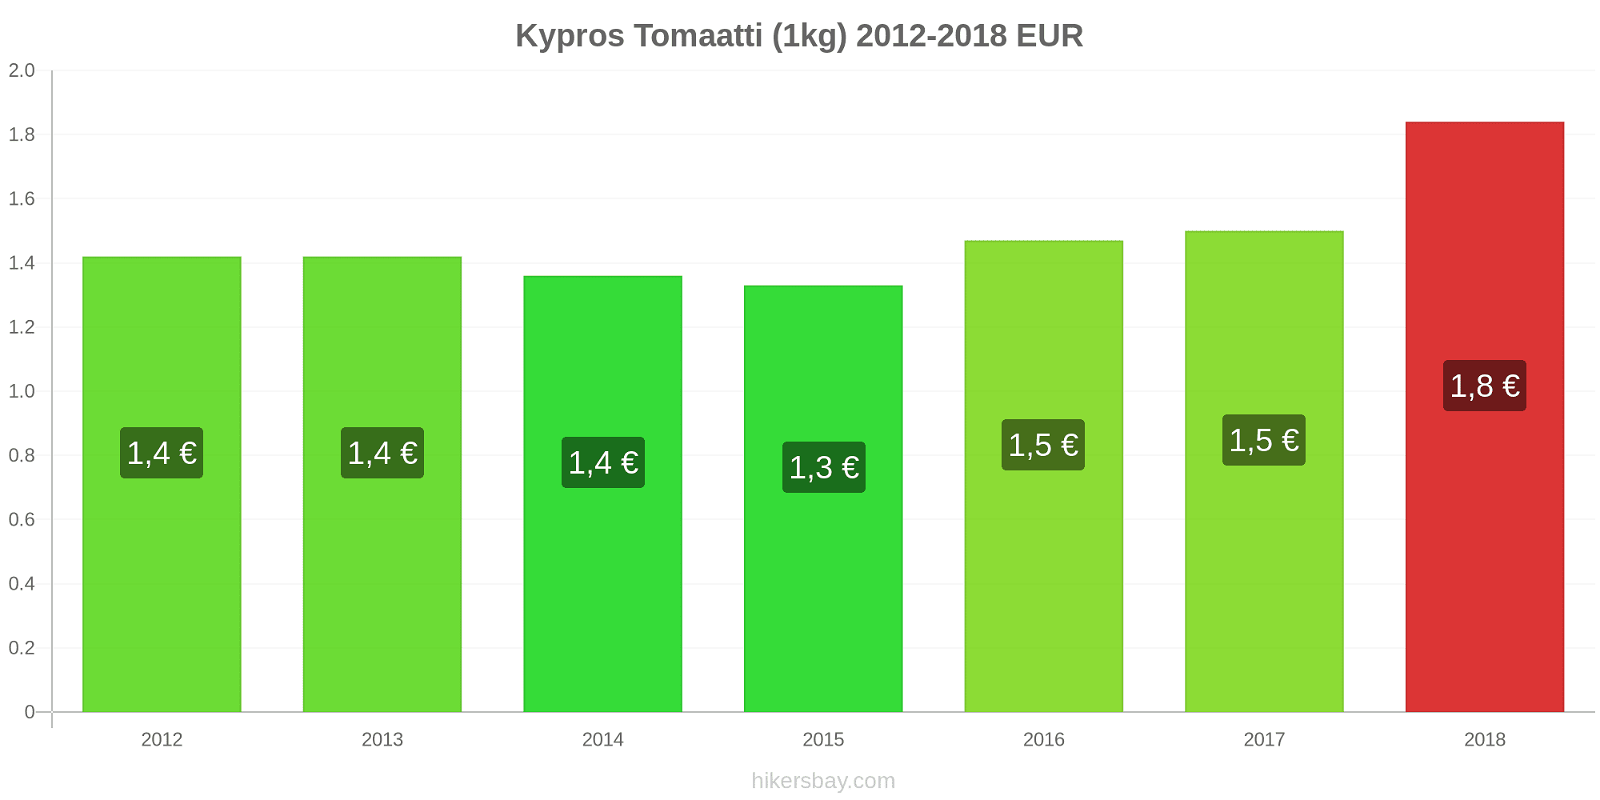 Kypros hintojen muutokset Tomaatti (1kg) hikersbay.com